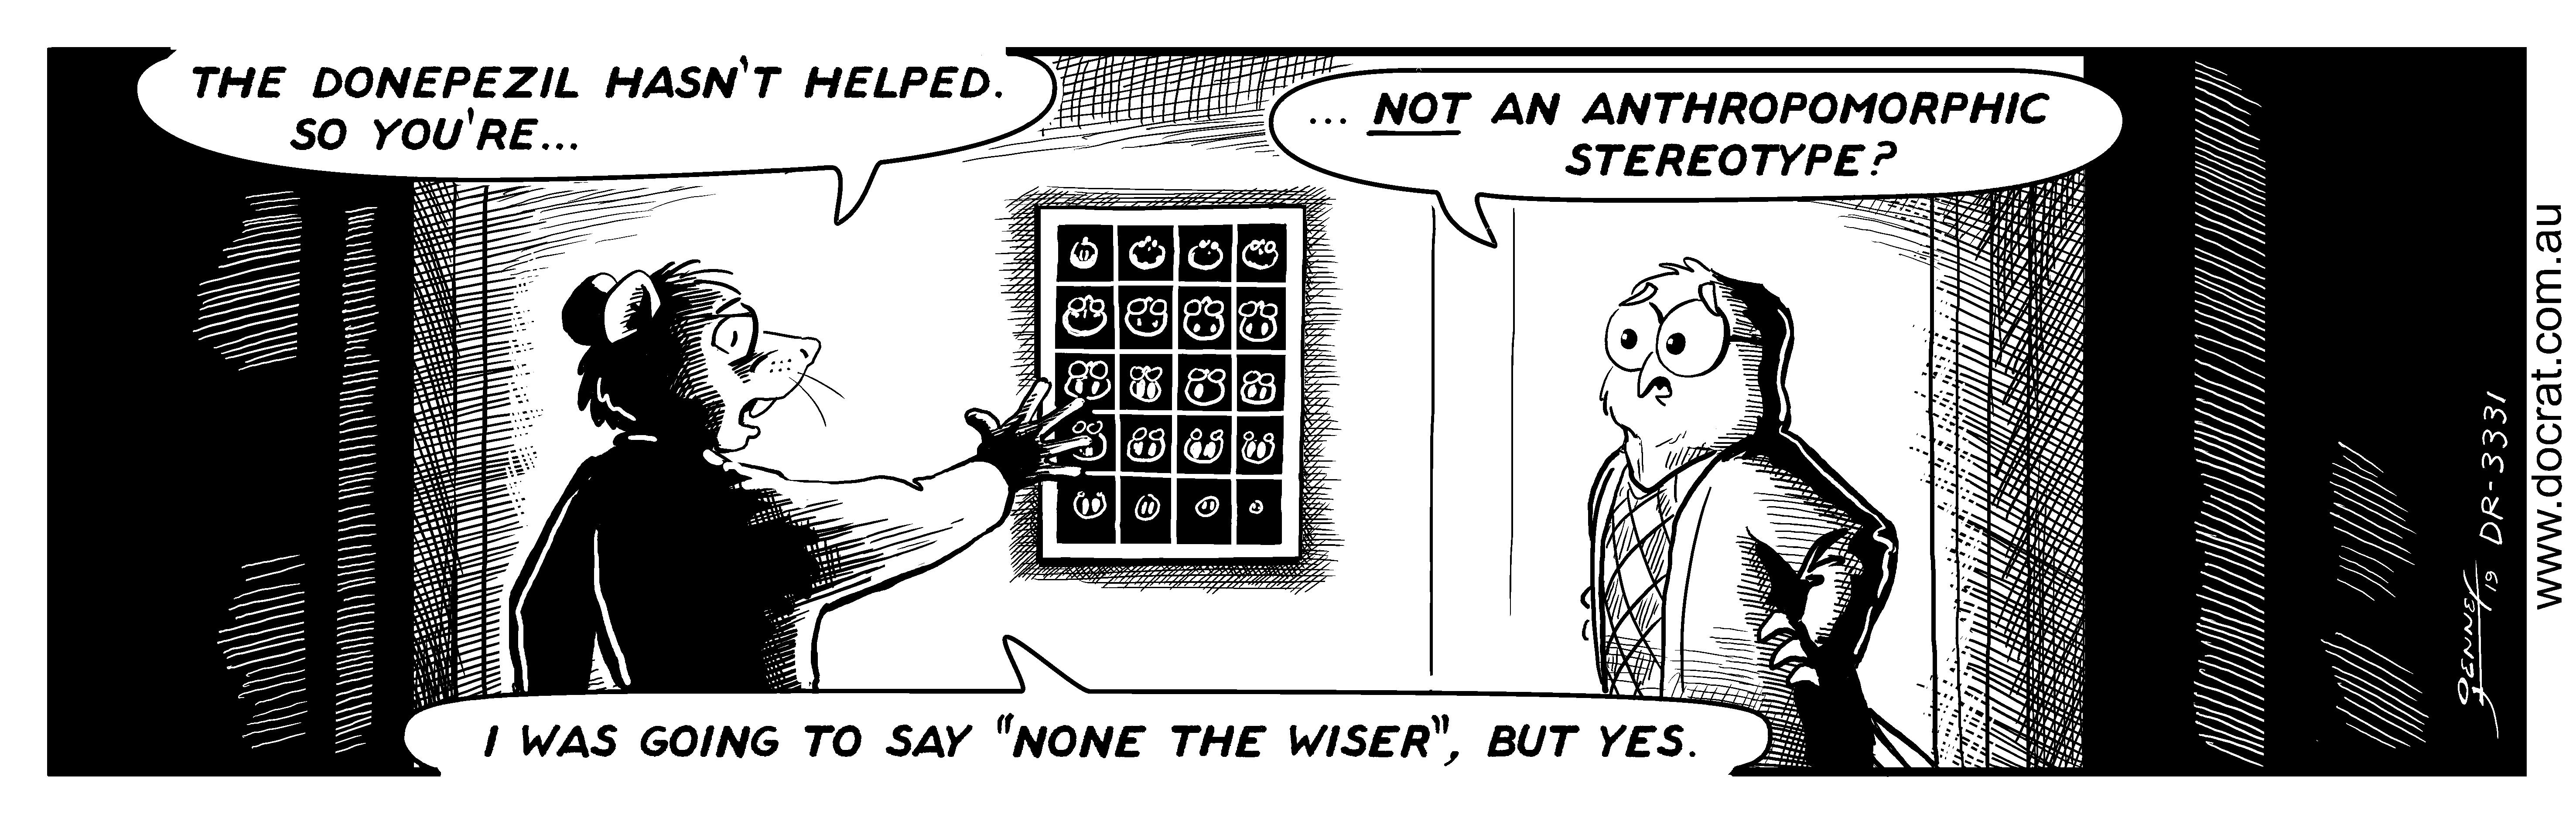 20190916